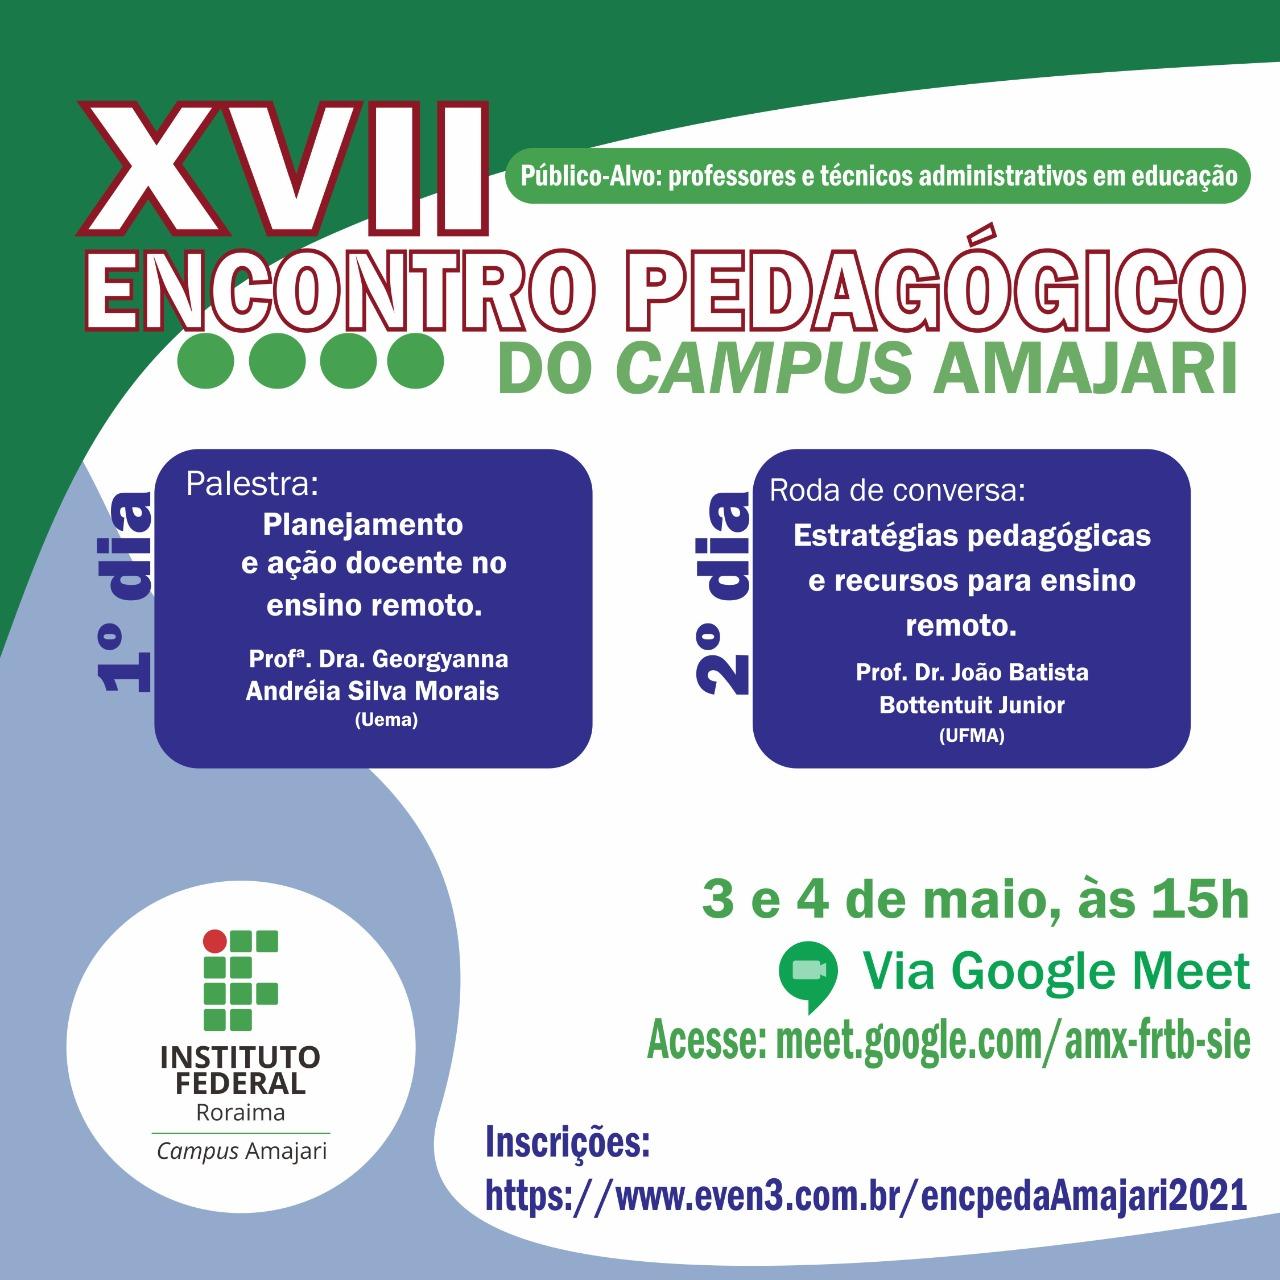 Encontro Pedagógico do Campus Amajari vai discutir estratégias pedagógicas para o ensino remoto